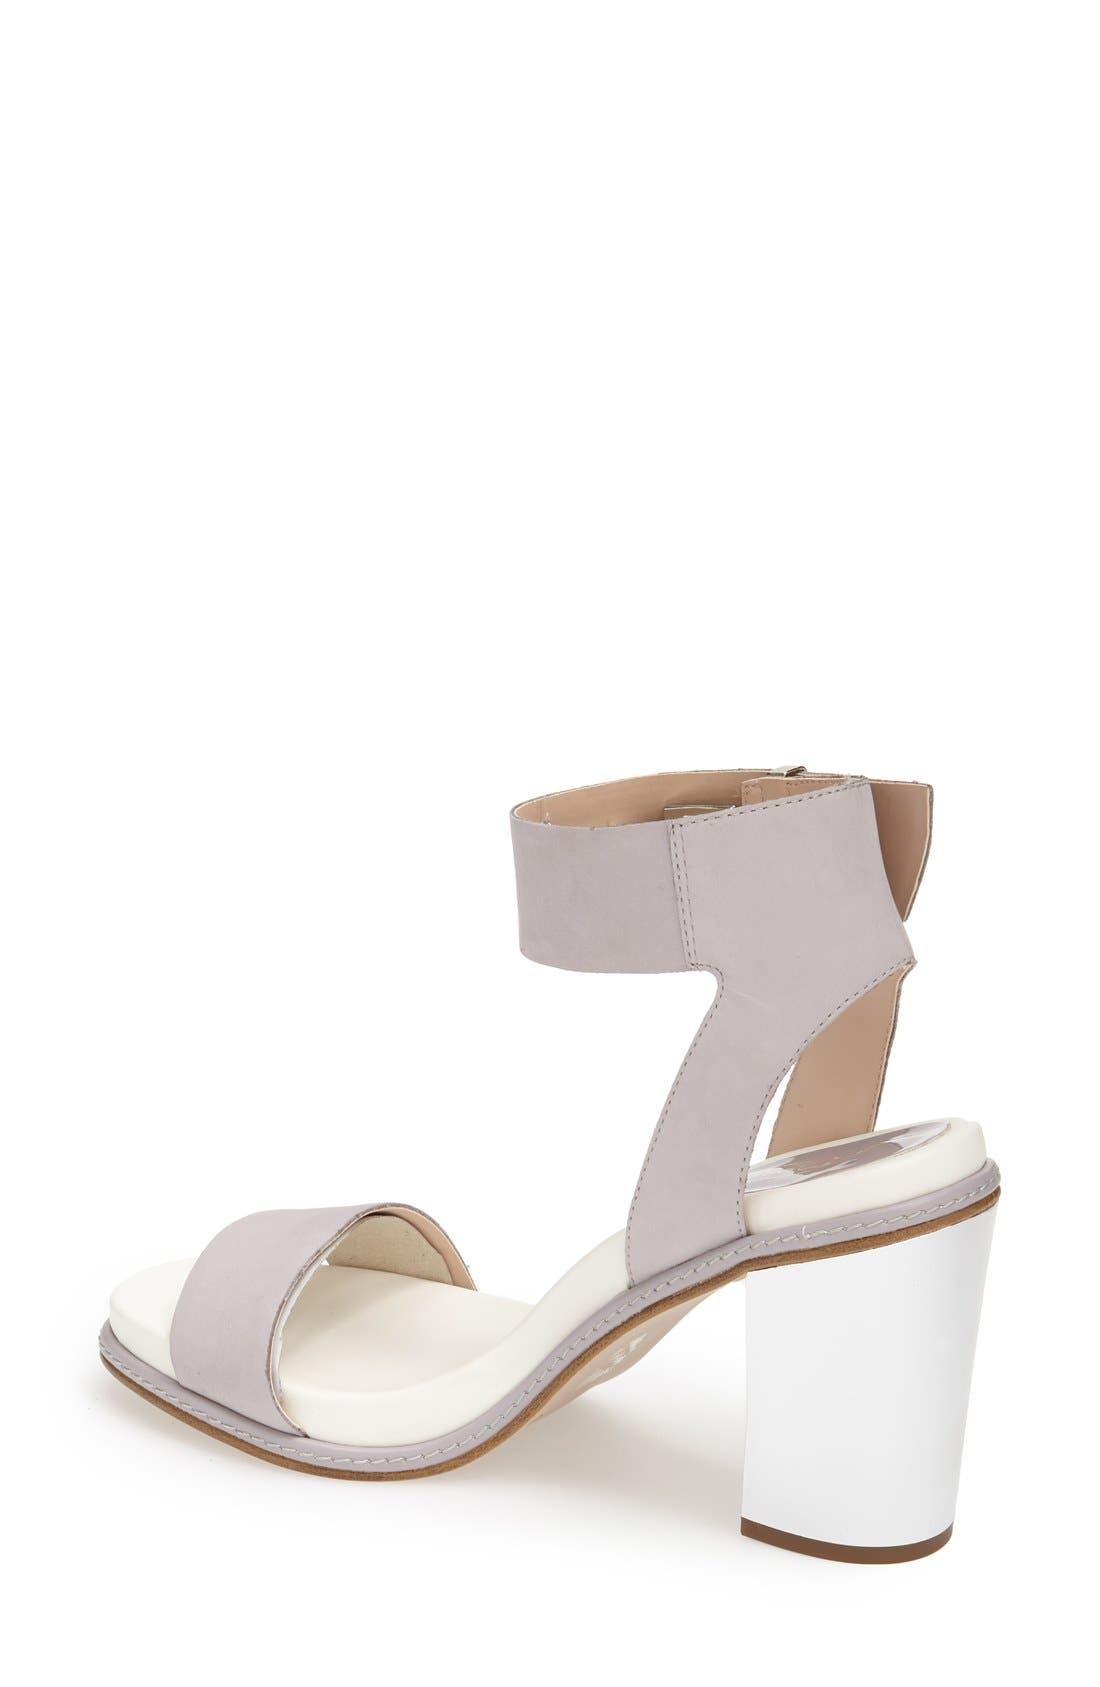 Alternate Image 2  - Topshop 'Reflect' Metallic Heel Leather Sandal (Women)